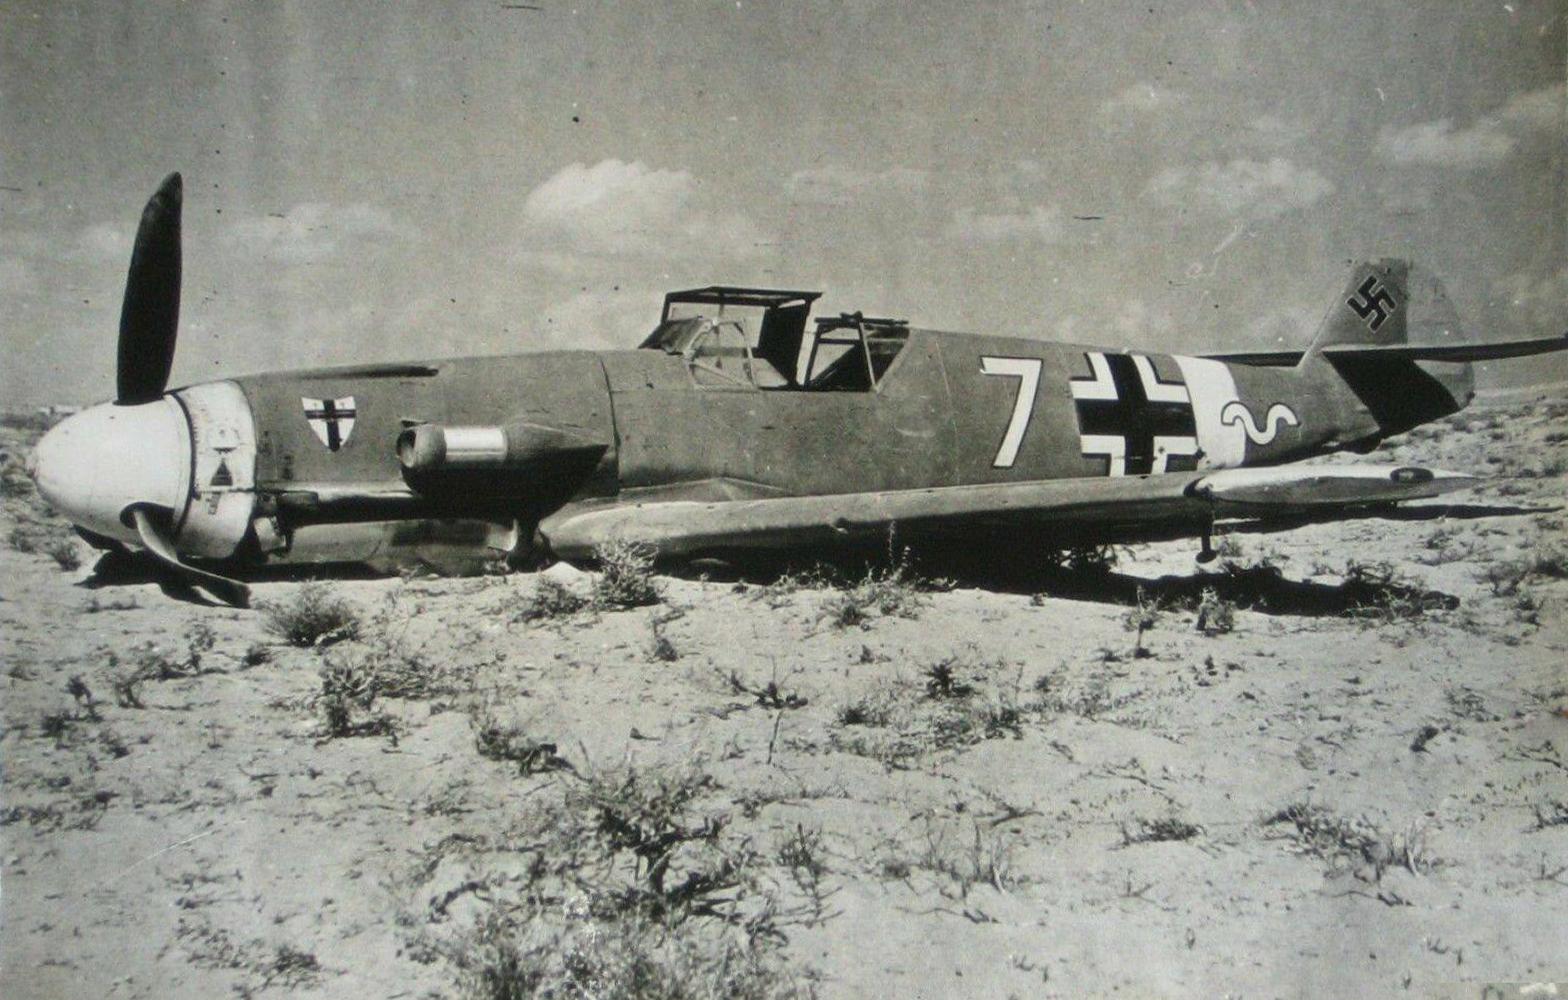 Messerschmitt Bf 109F4Trop 9.JG27 Yellow 7 Helmuth Fenzl WNr 13136 crash Egypt 26th Oct 1942 ebay1